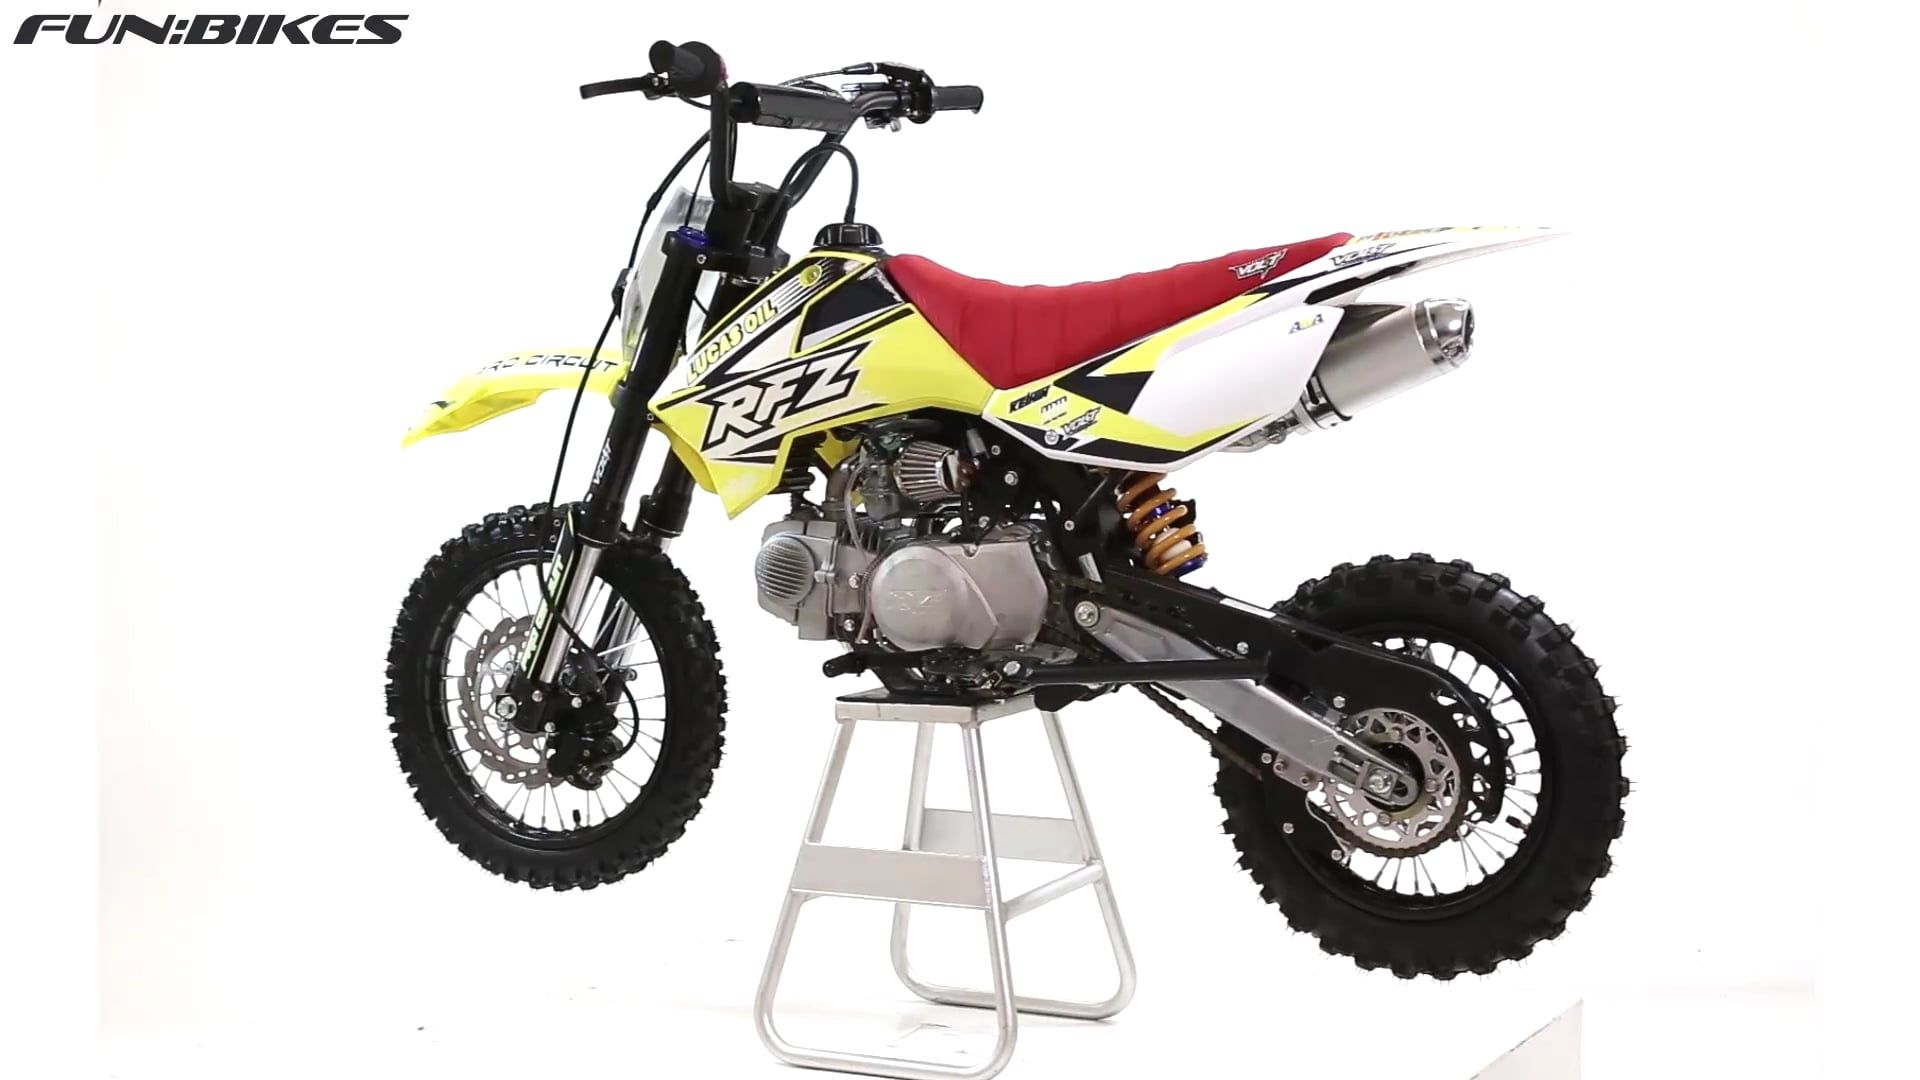 M2r racing rfz140 140cc 76cm yellow pit bike